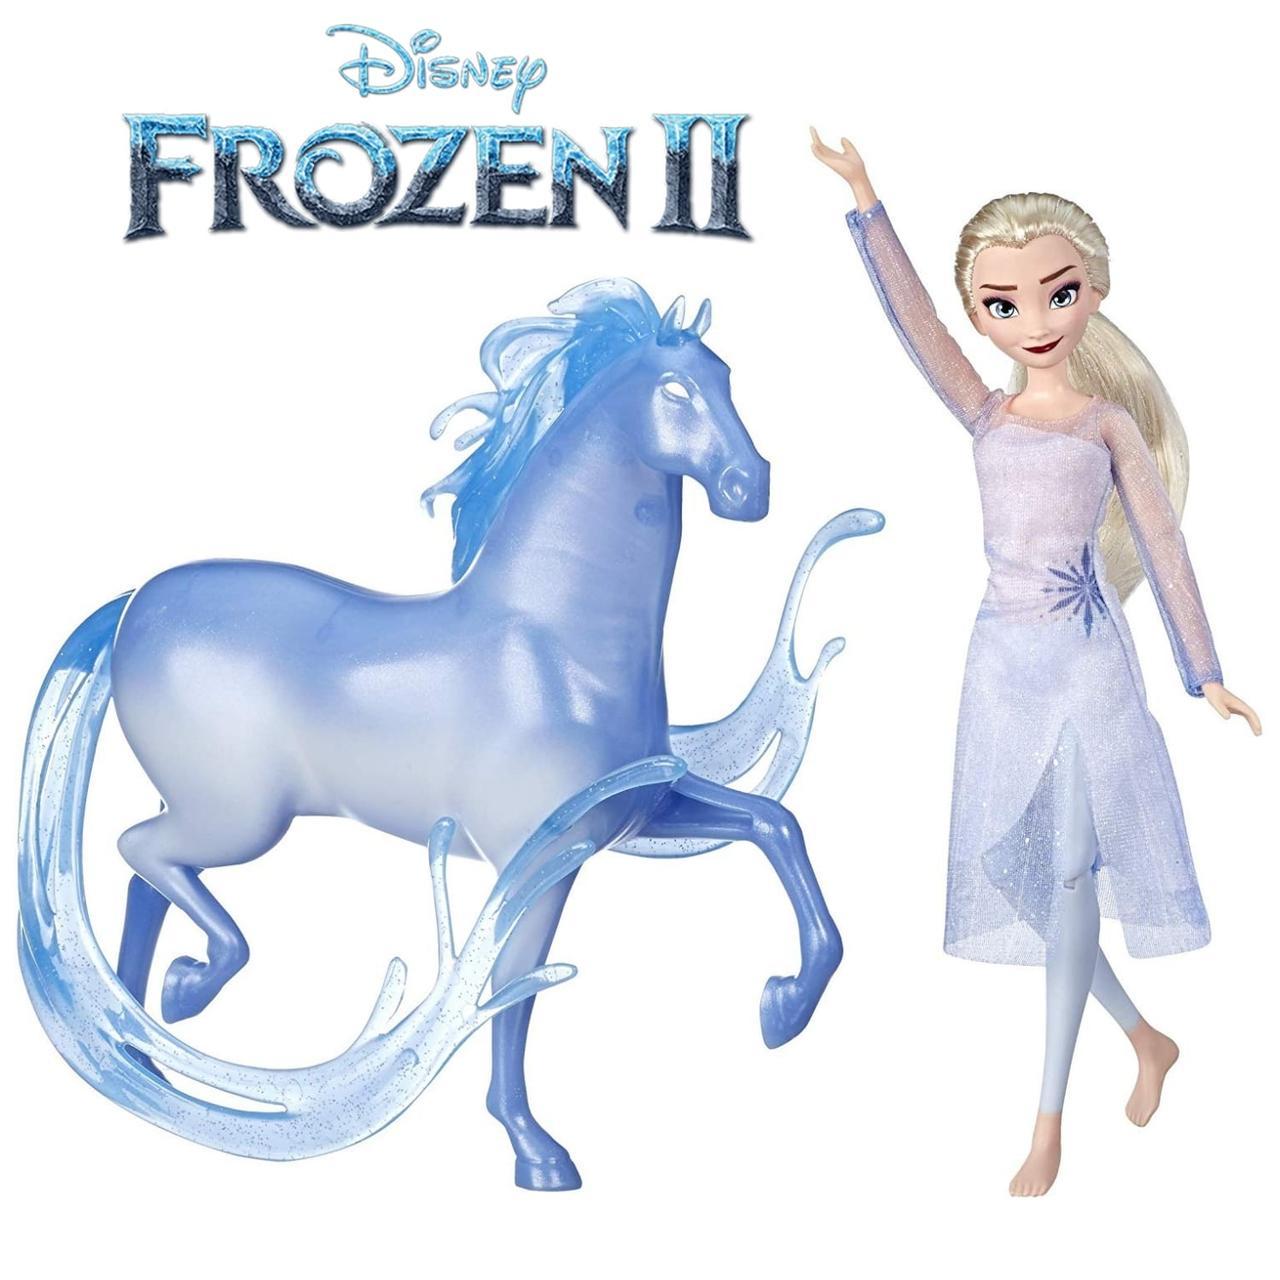 Лялька Ельза Крижане серце 2 з конем Нокк Disney Frozen Elsa Fashion Doll & Figure Nokk